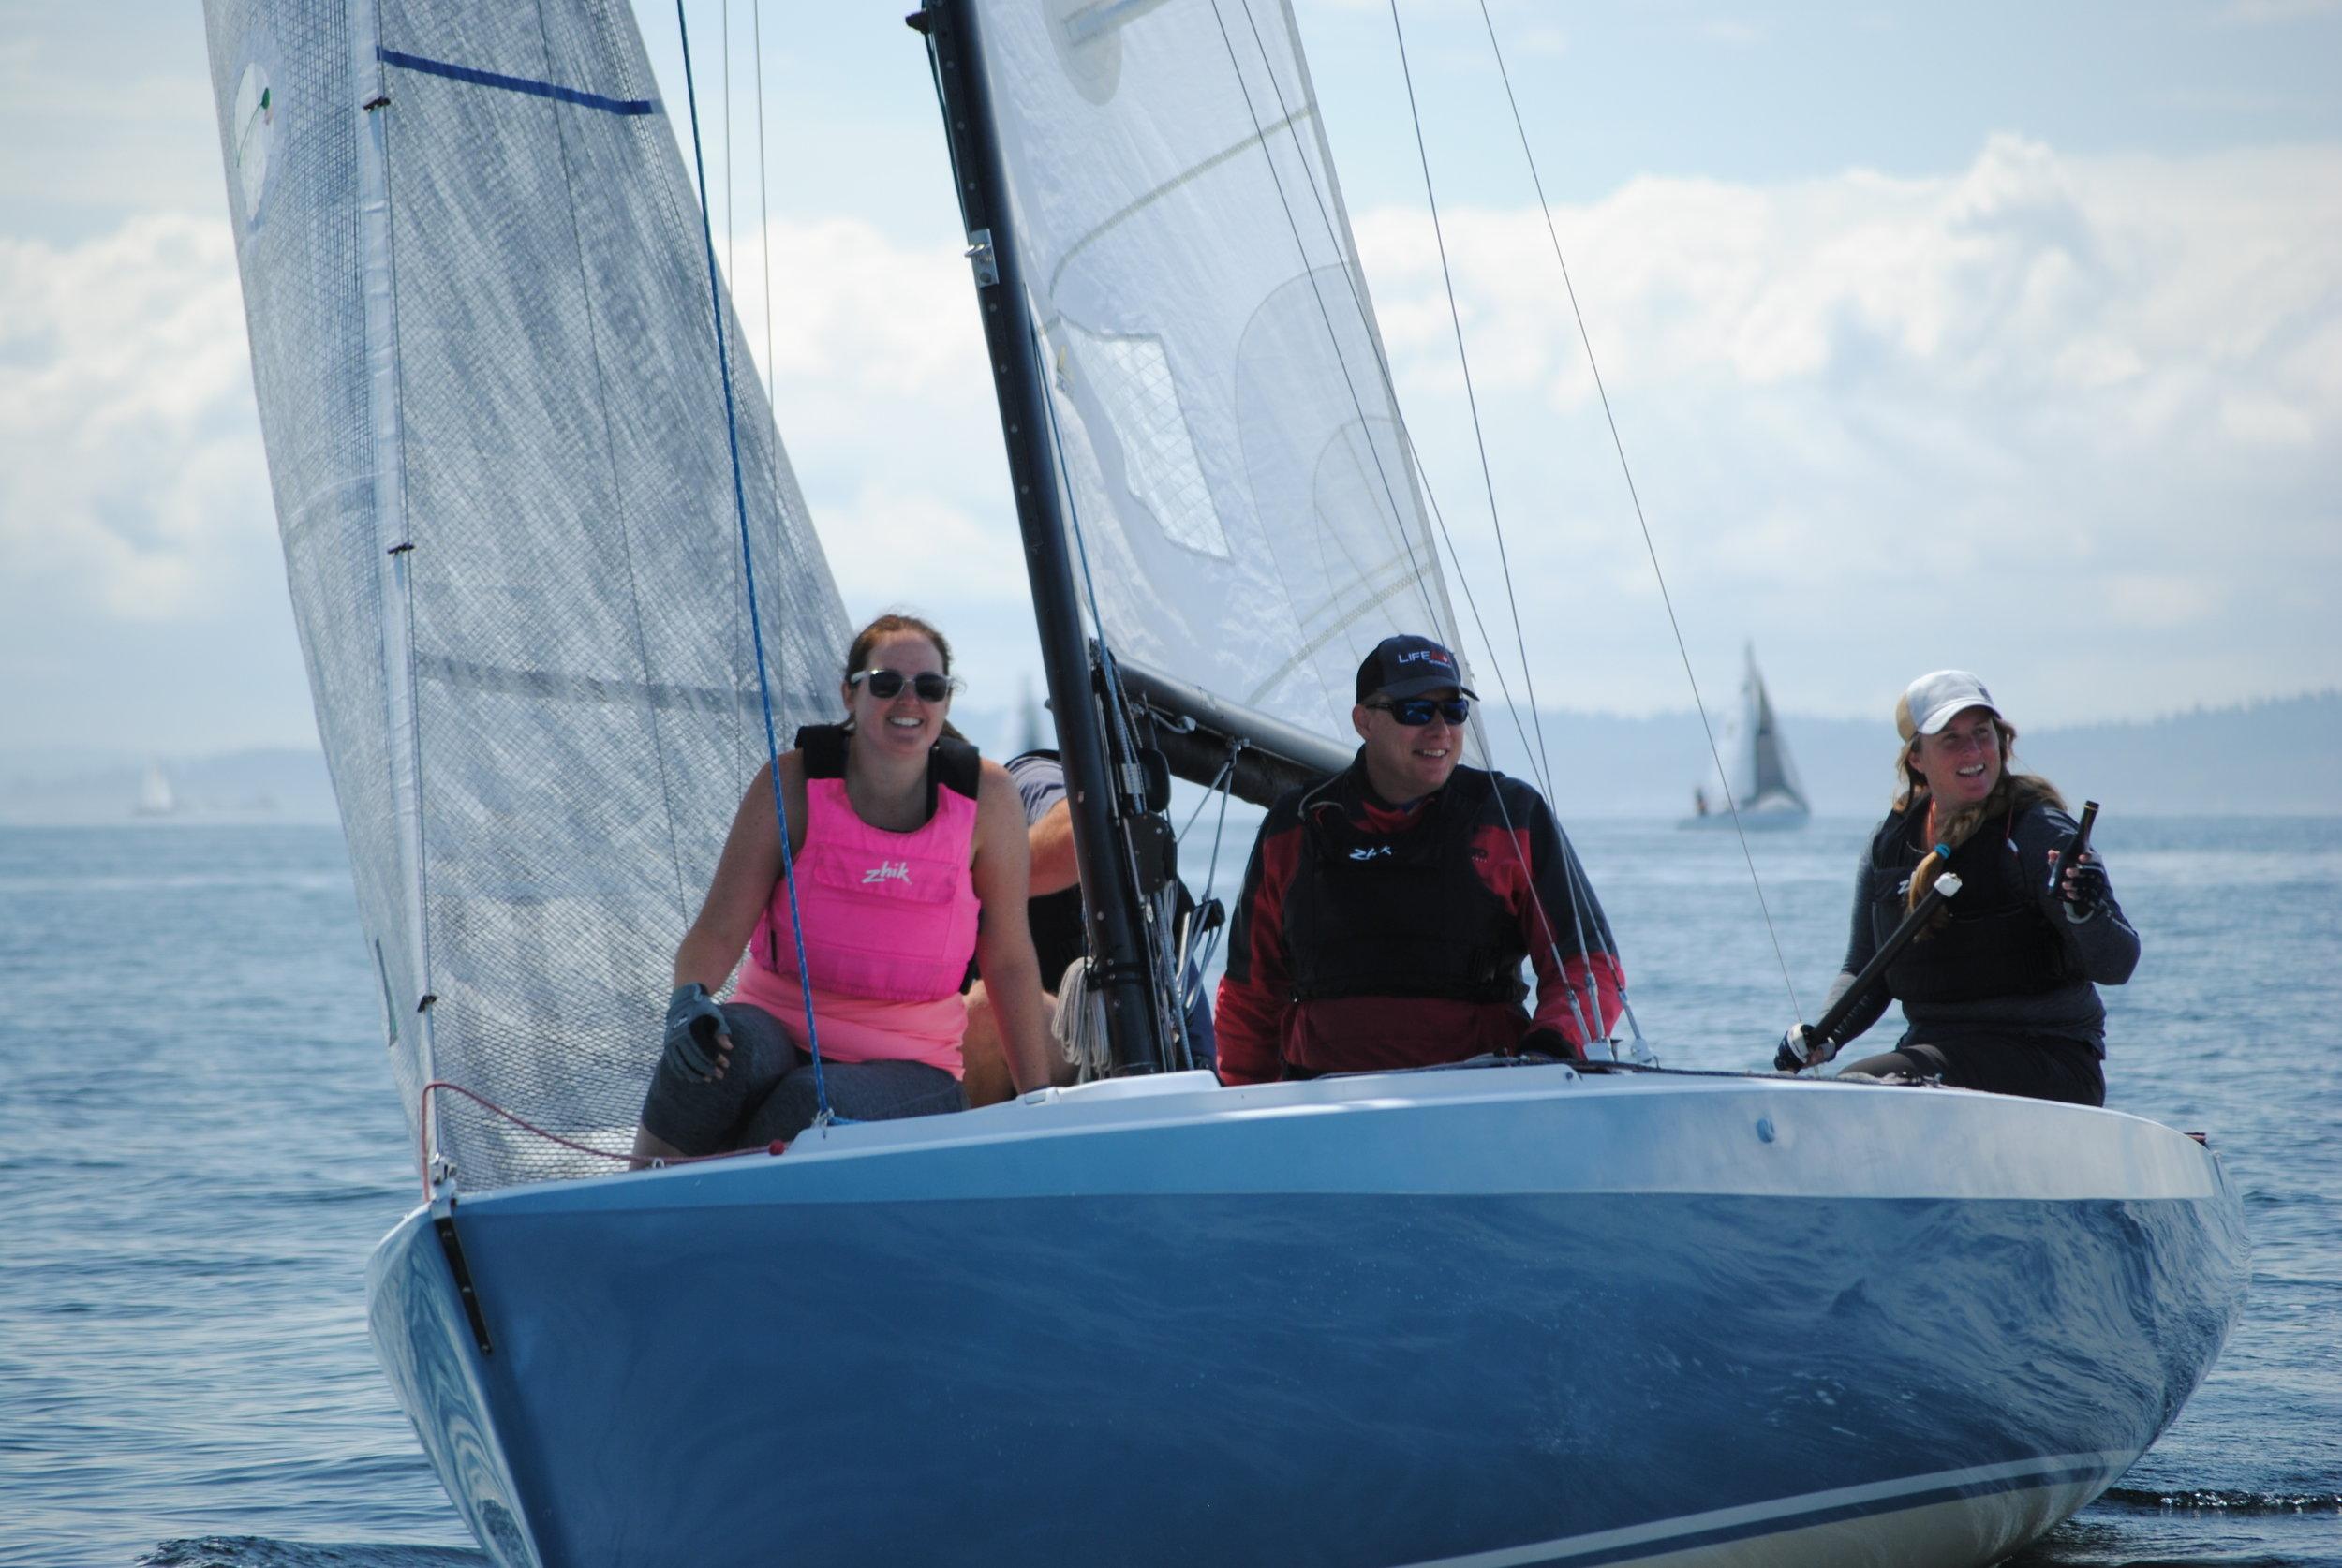 103 returns to from Santa Cruz to familiar waters